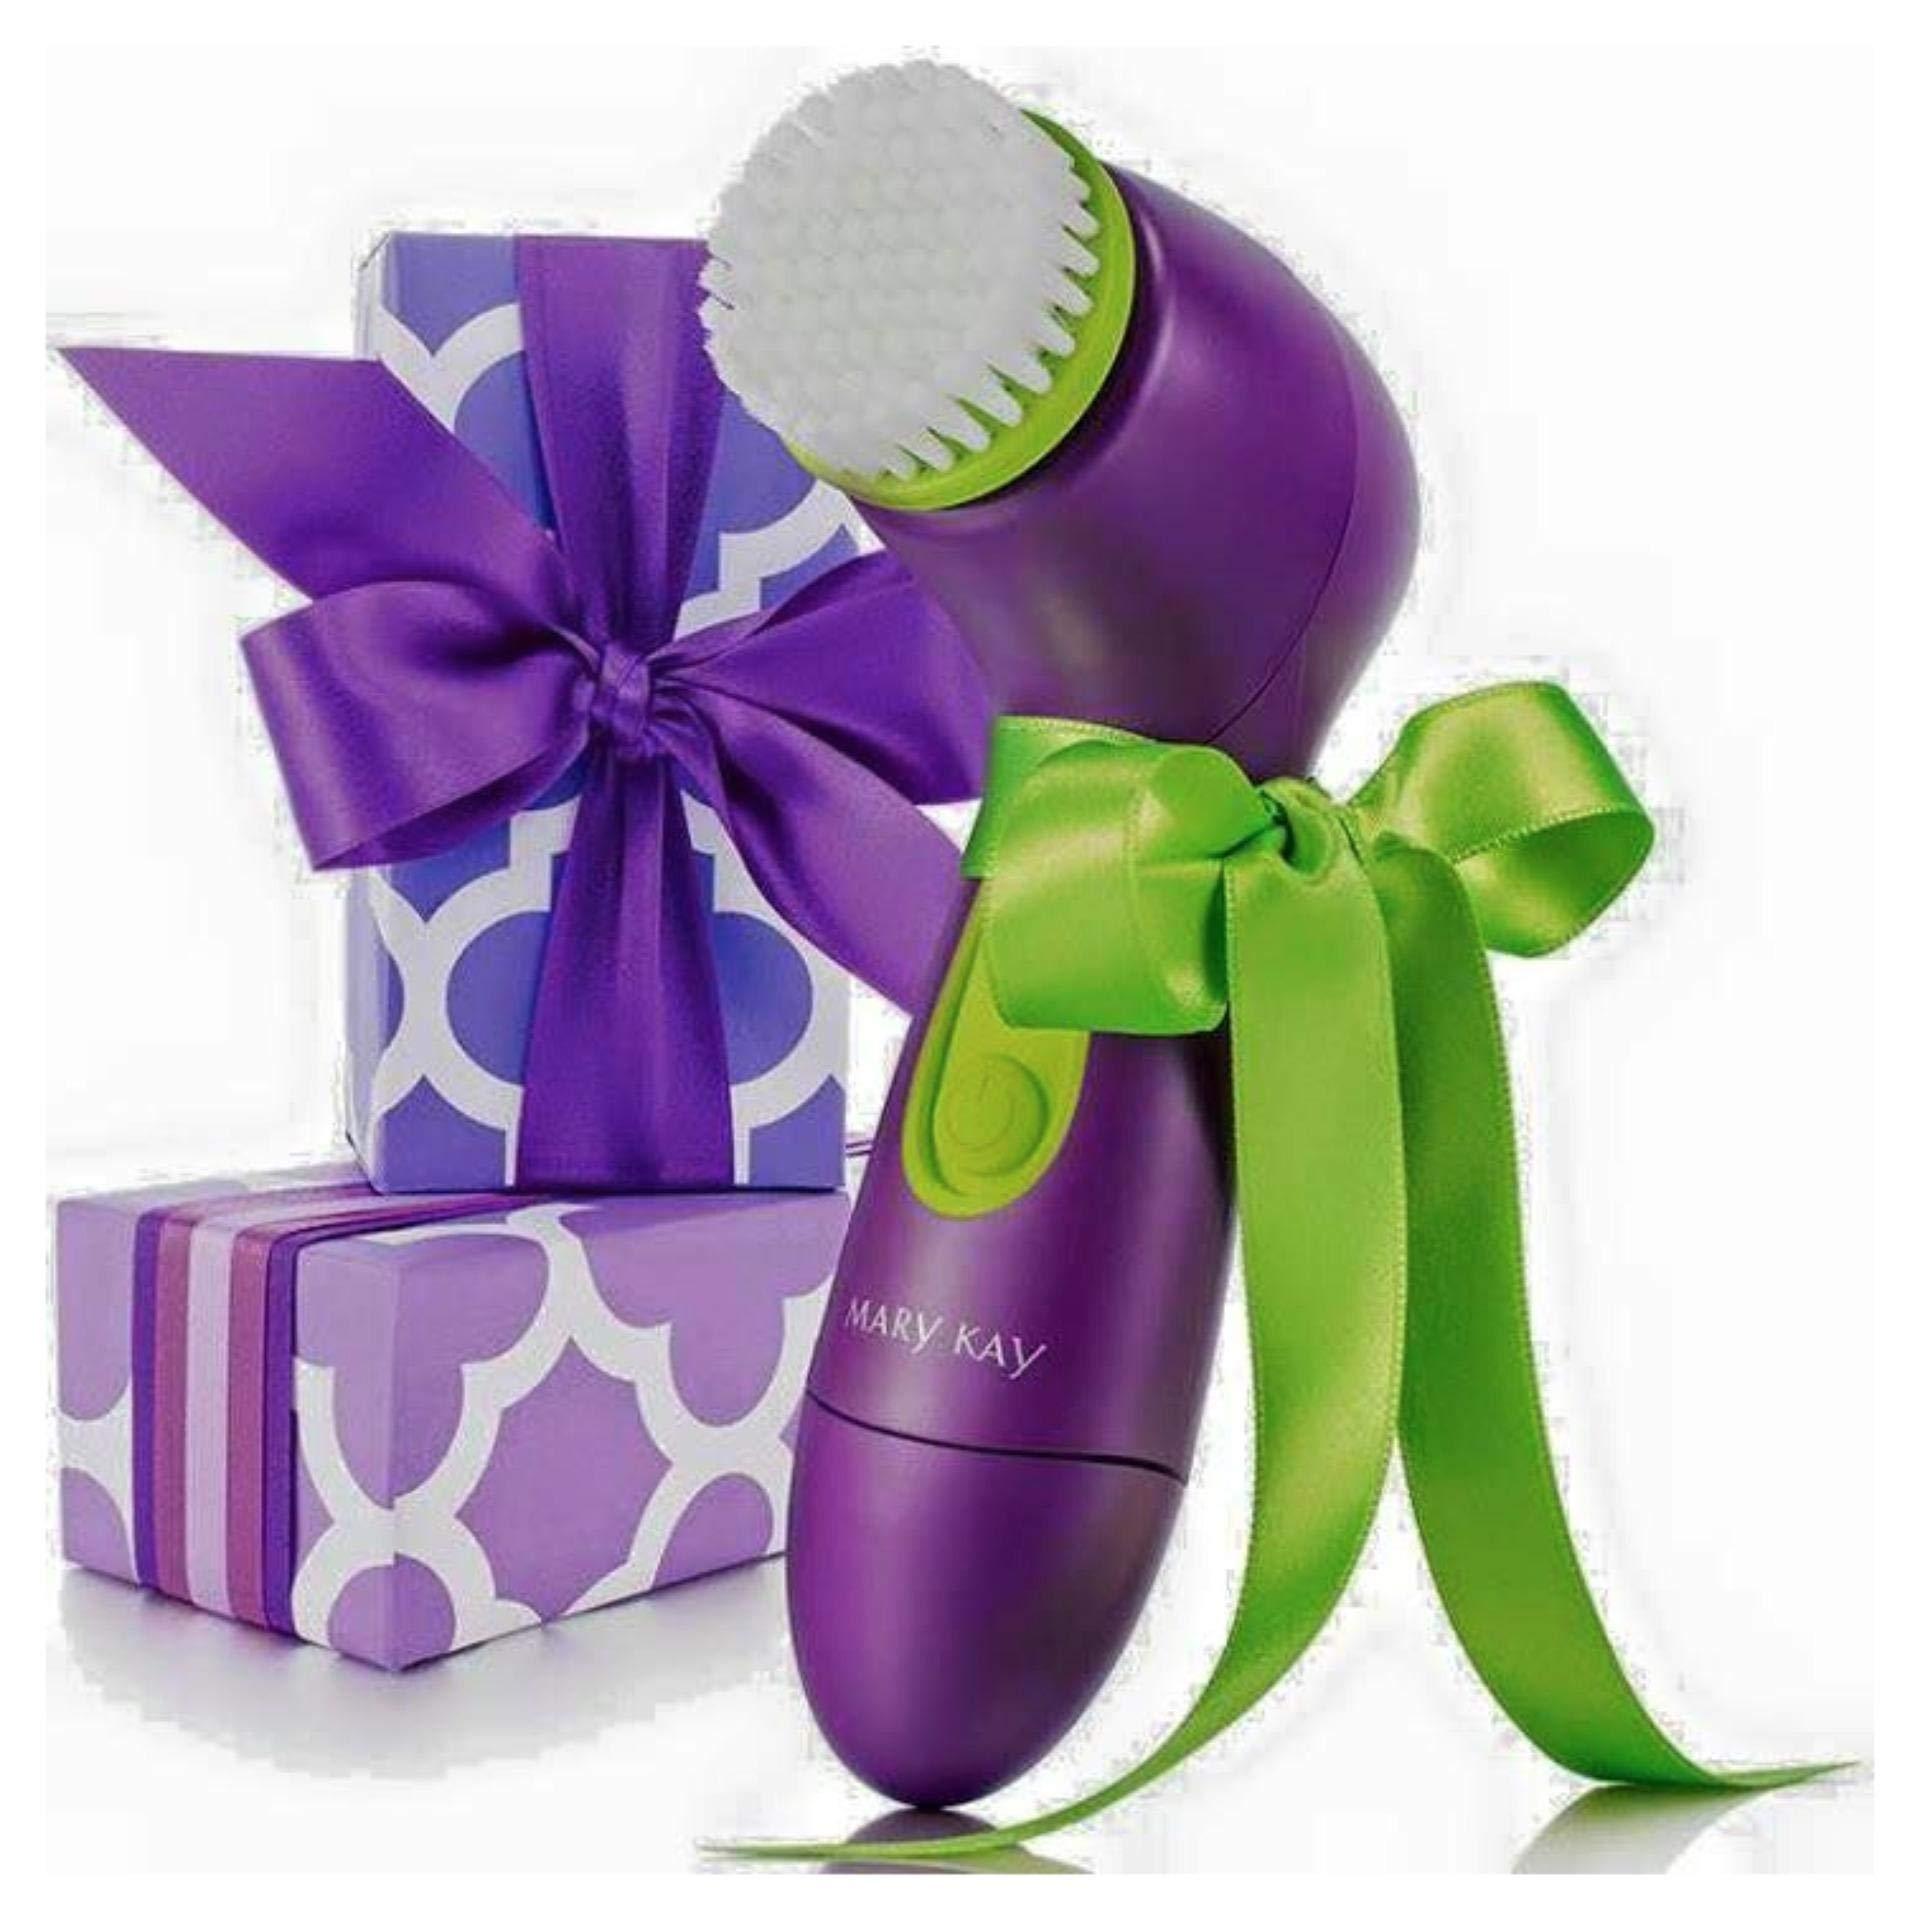 Mary Kay Skinvigorate Cleansing Brush Ltd Edt